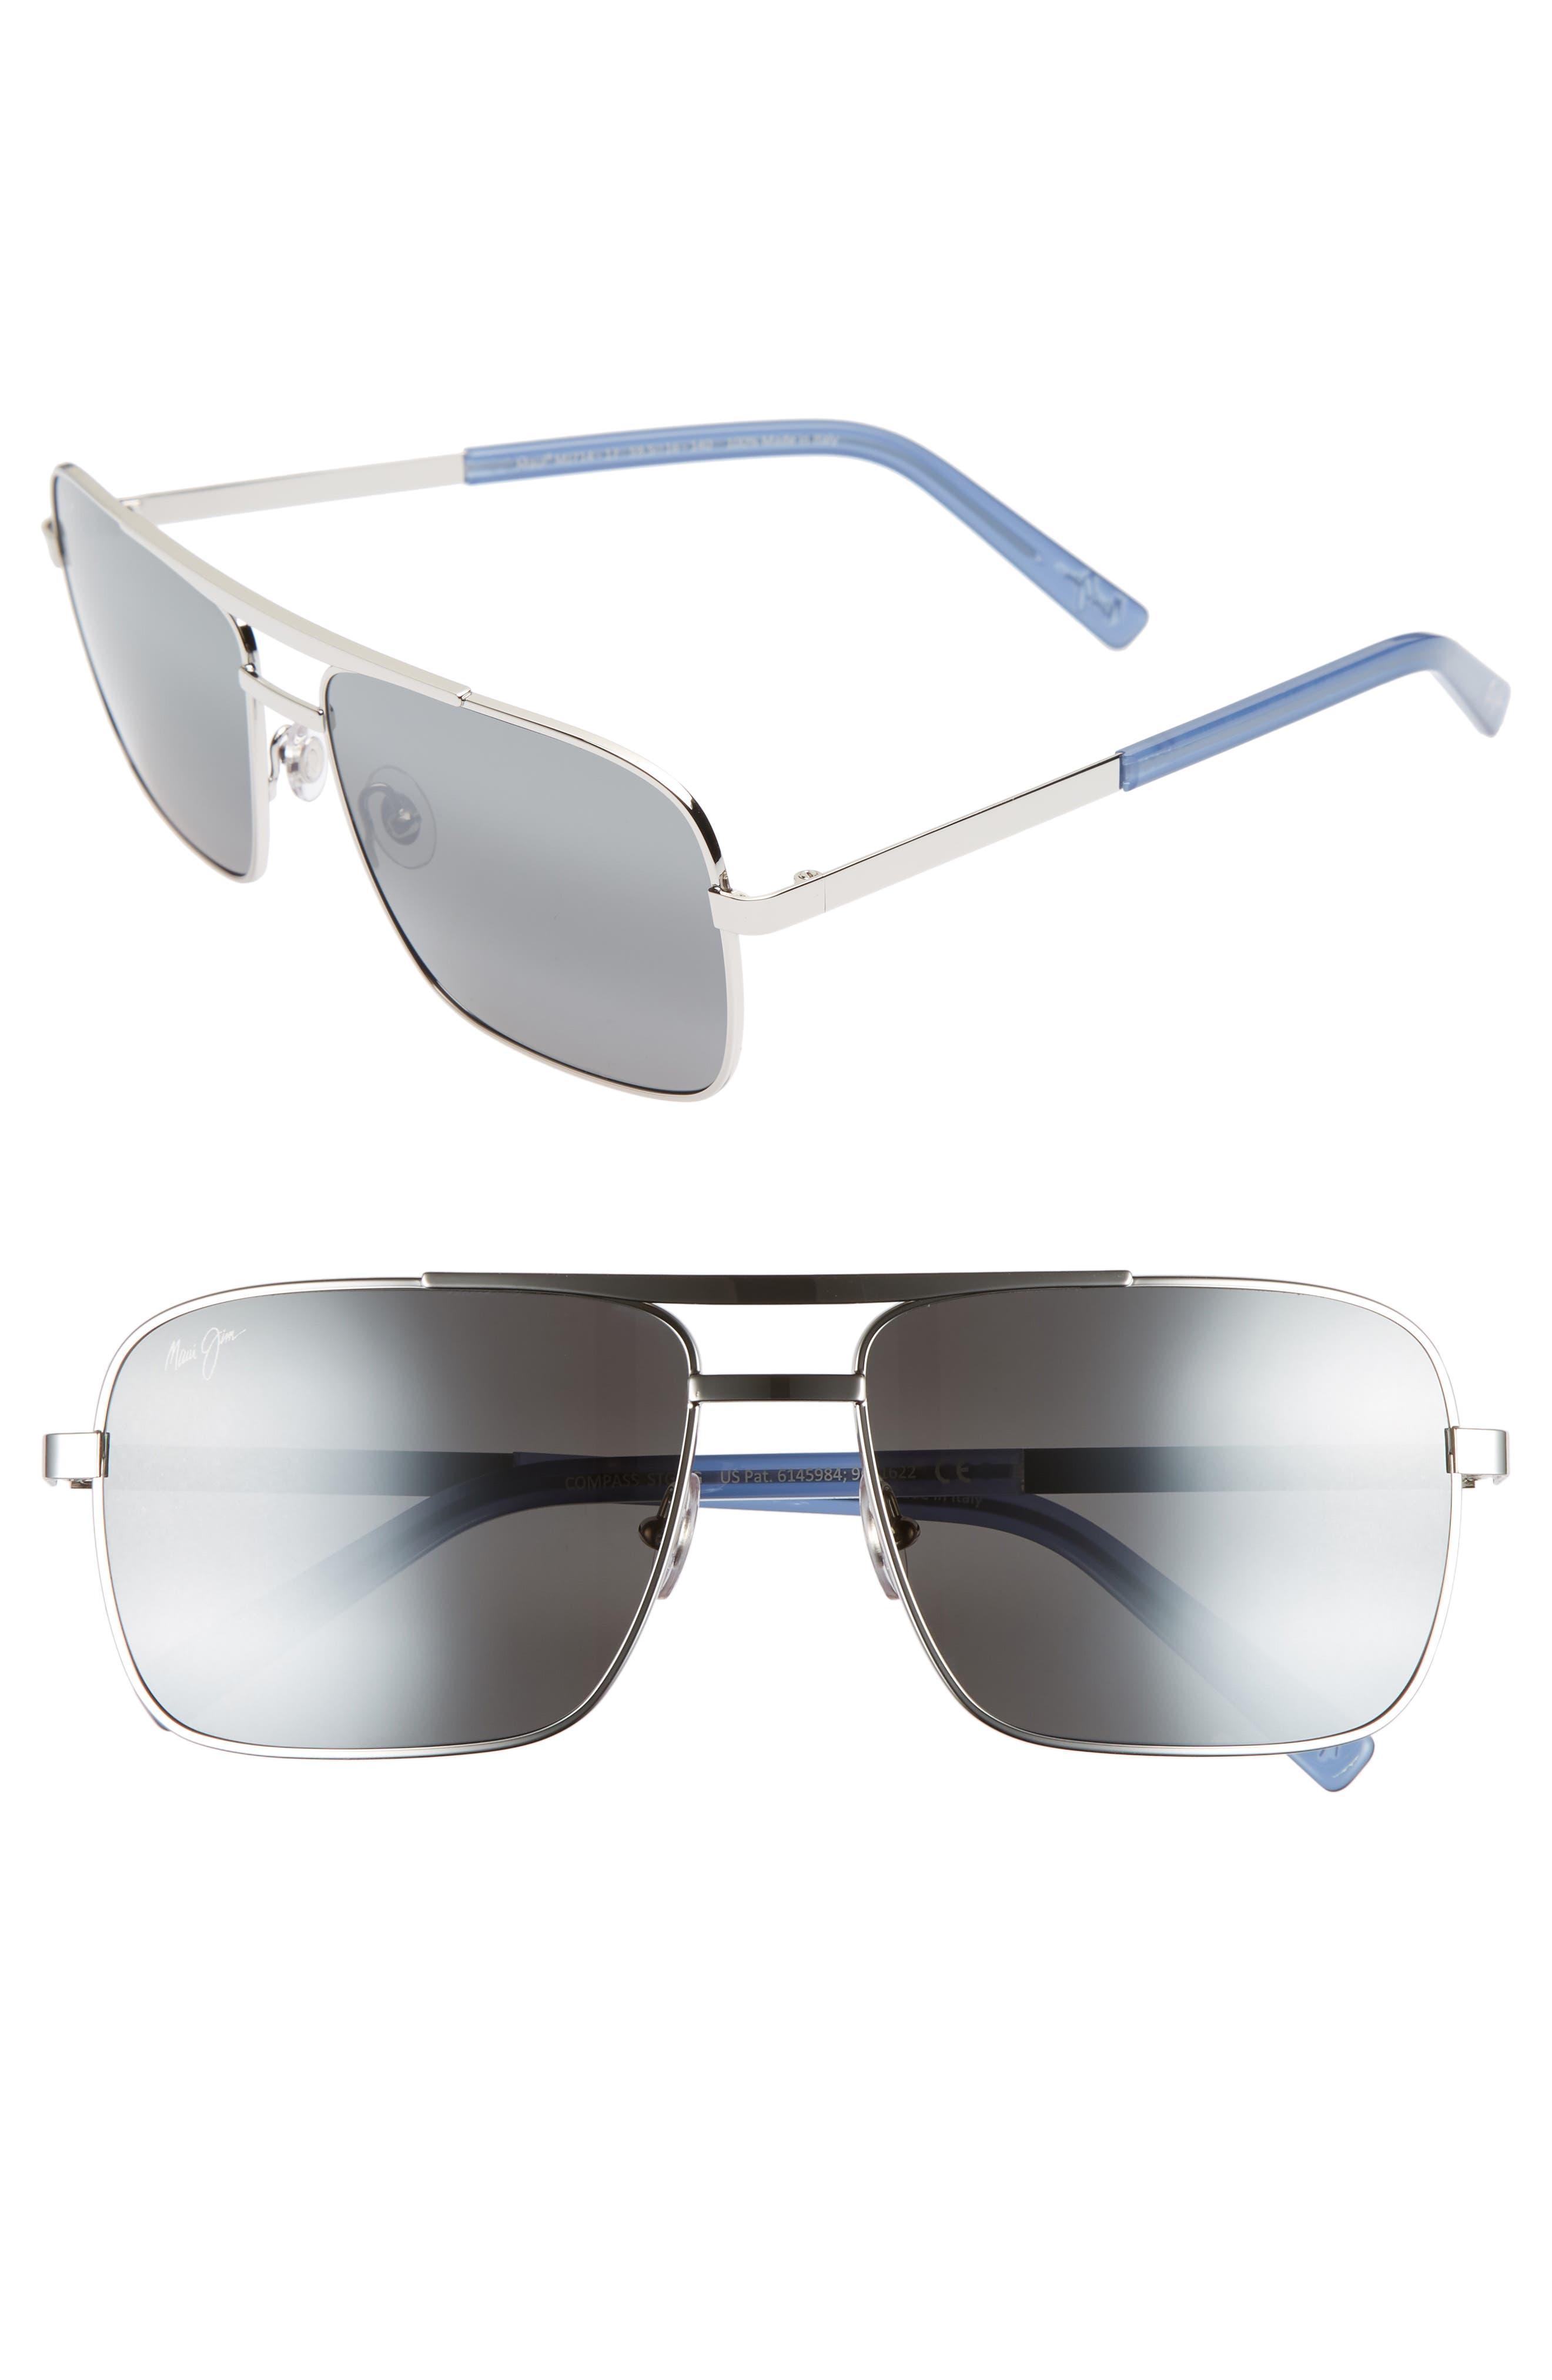 Maui Jim Compass 60Mm Polarized Aviator Sunglasses -